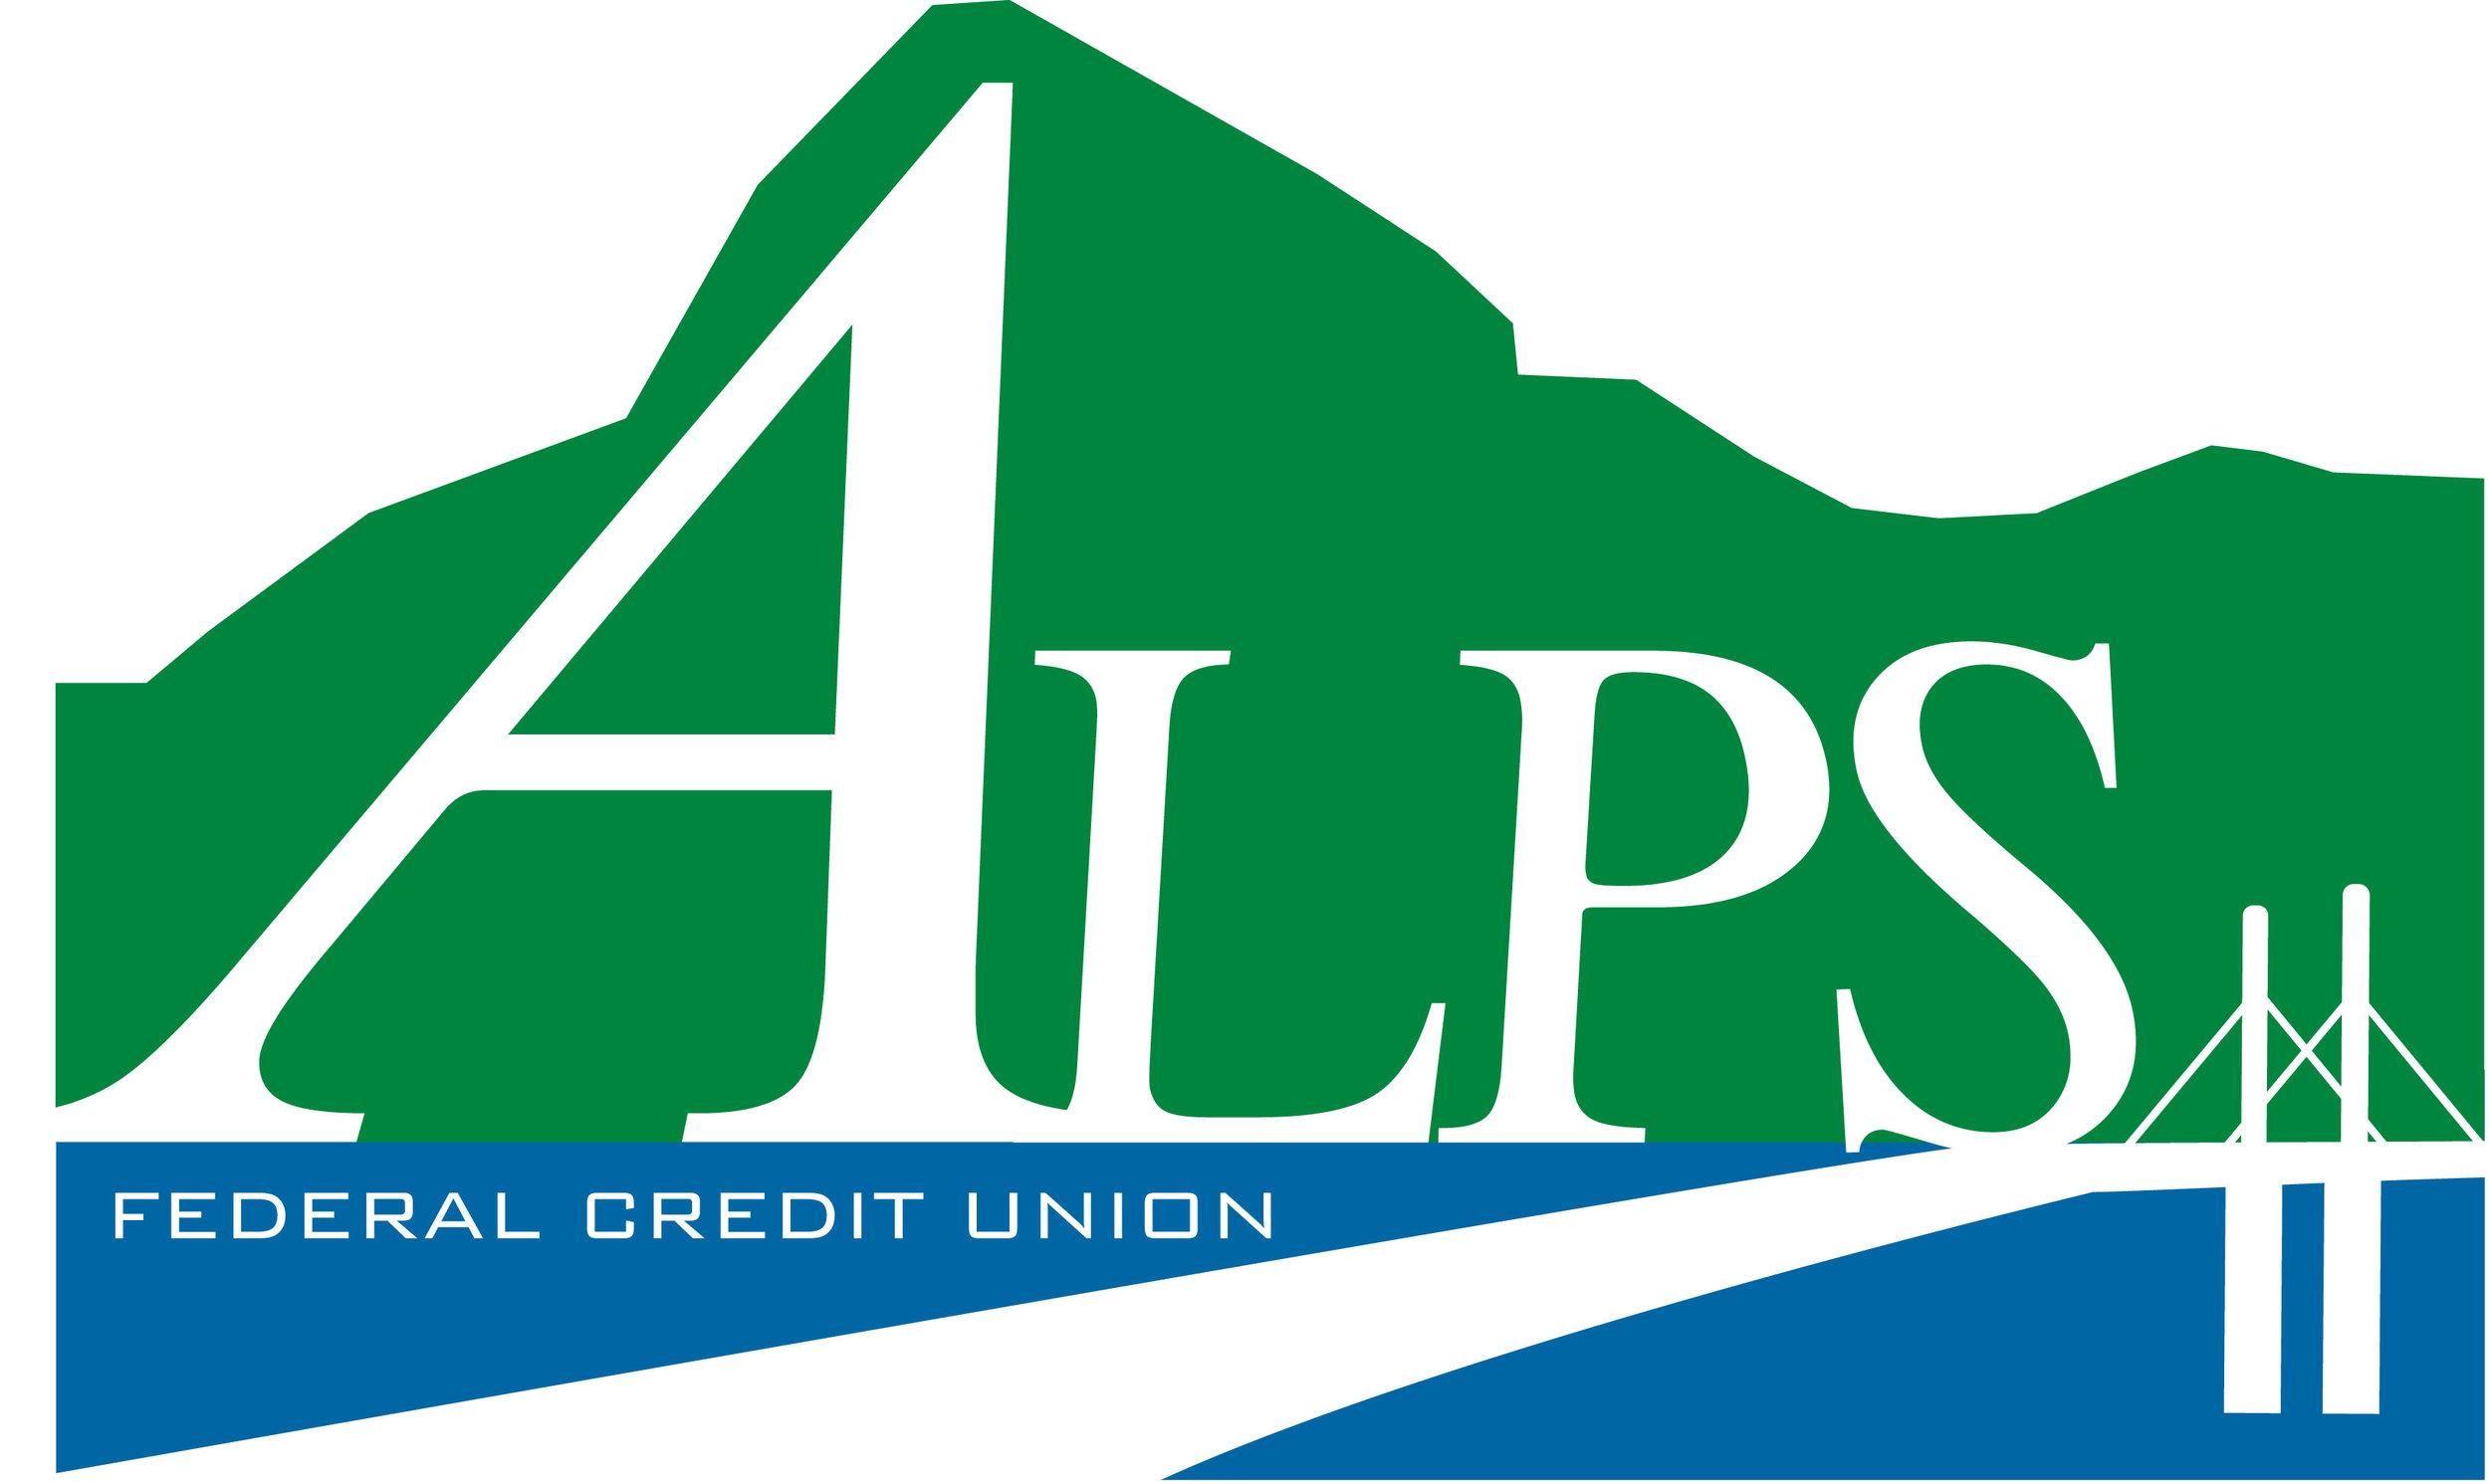 Alps_Final_high_rez.jpg